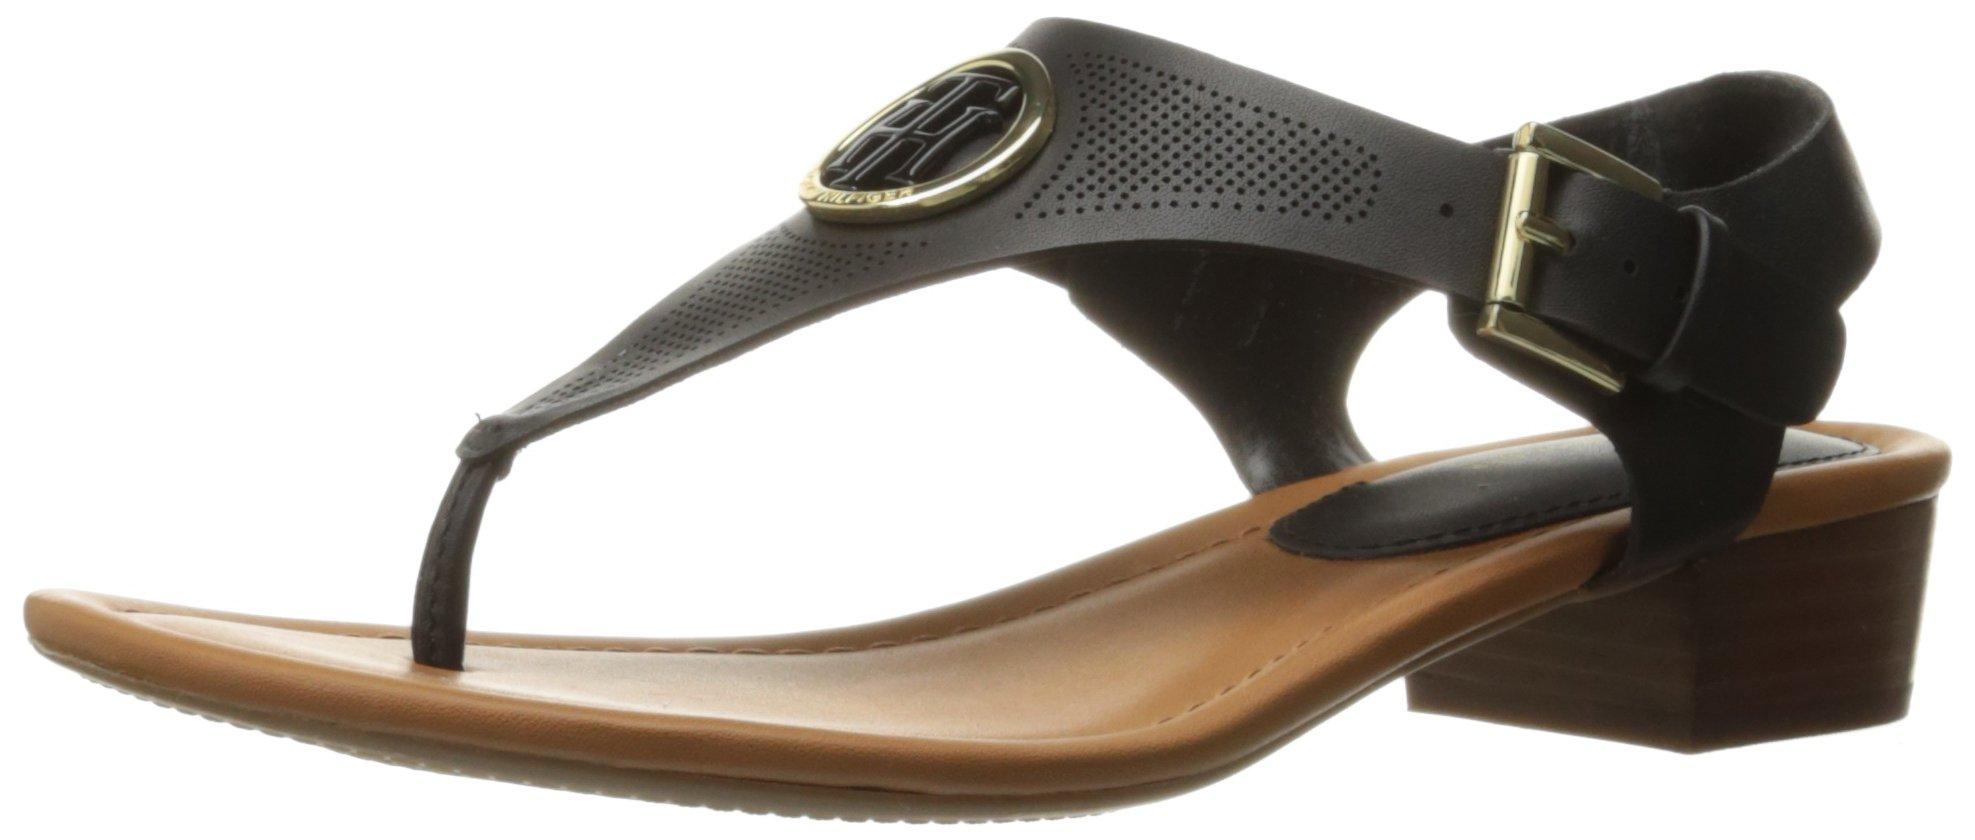 Tommy Hilfiger Women's Kandess Dress Sandal, Black, 8.5 M US